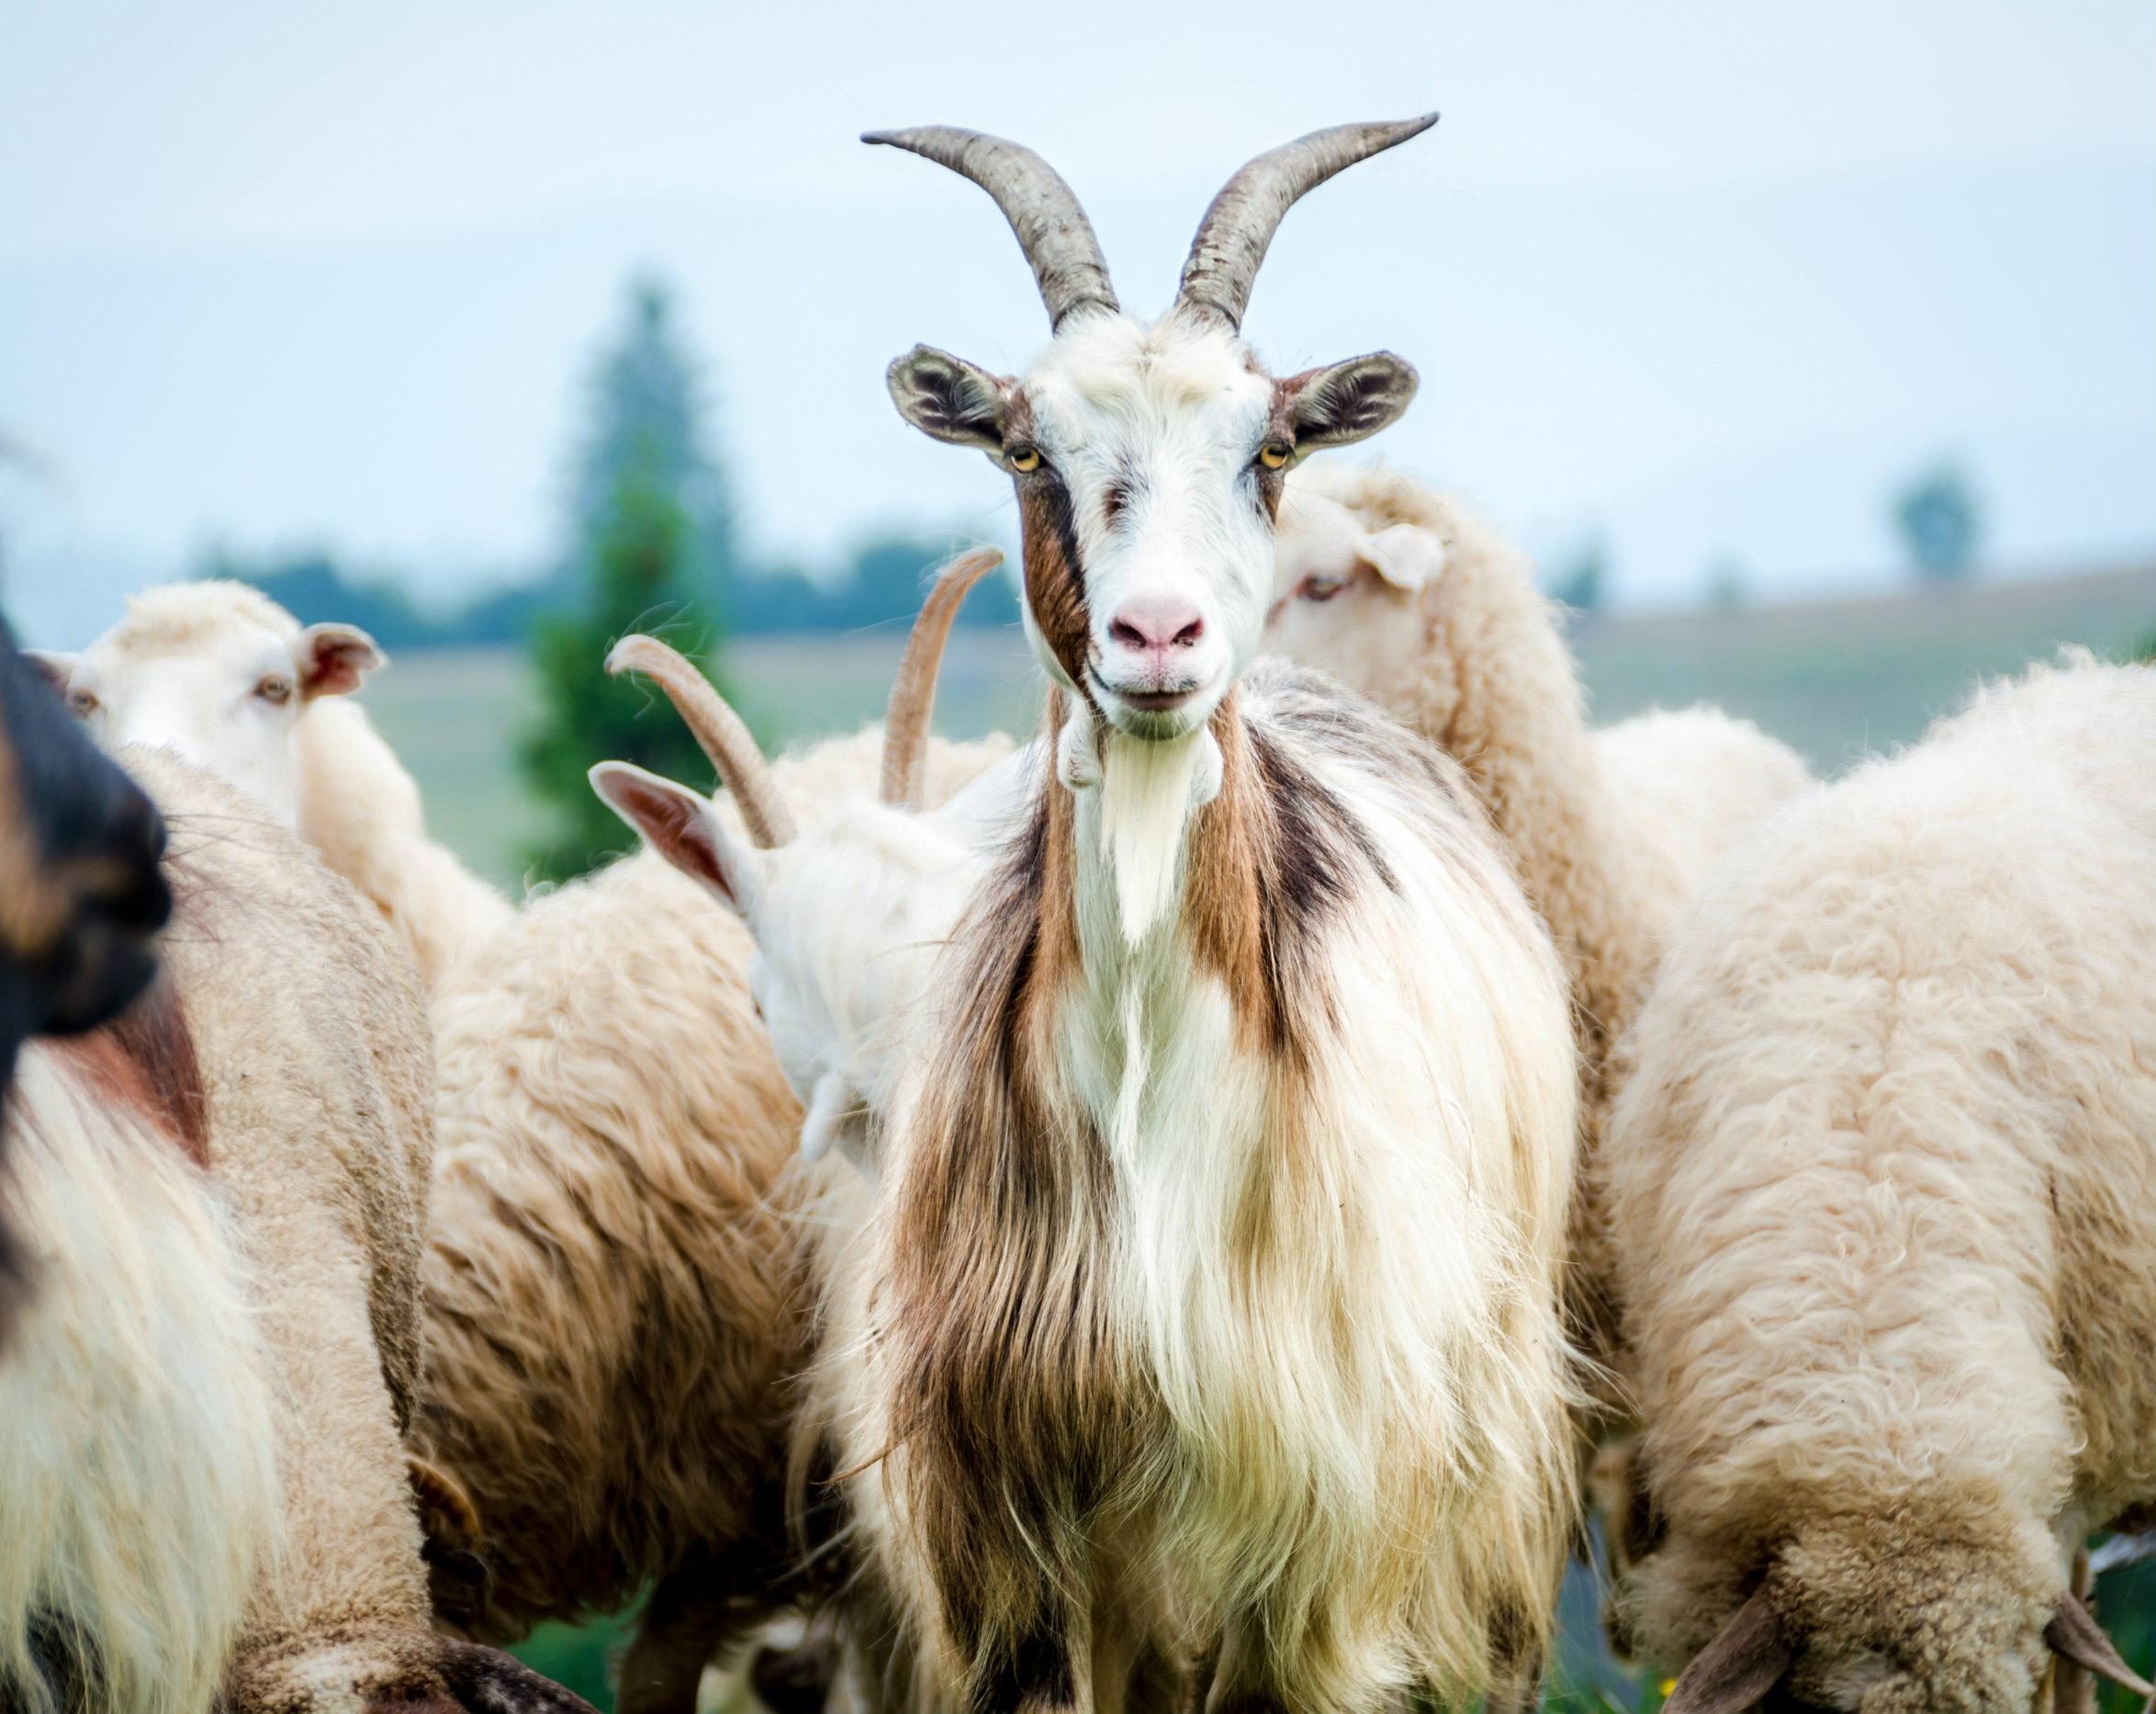 Livestock and animal science